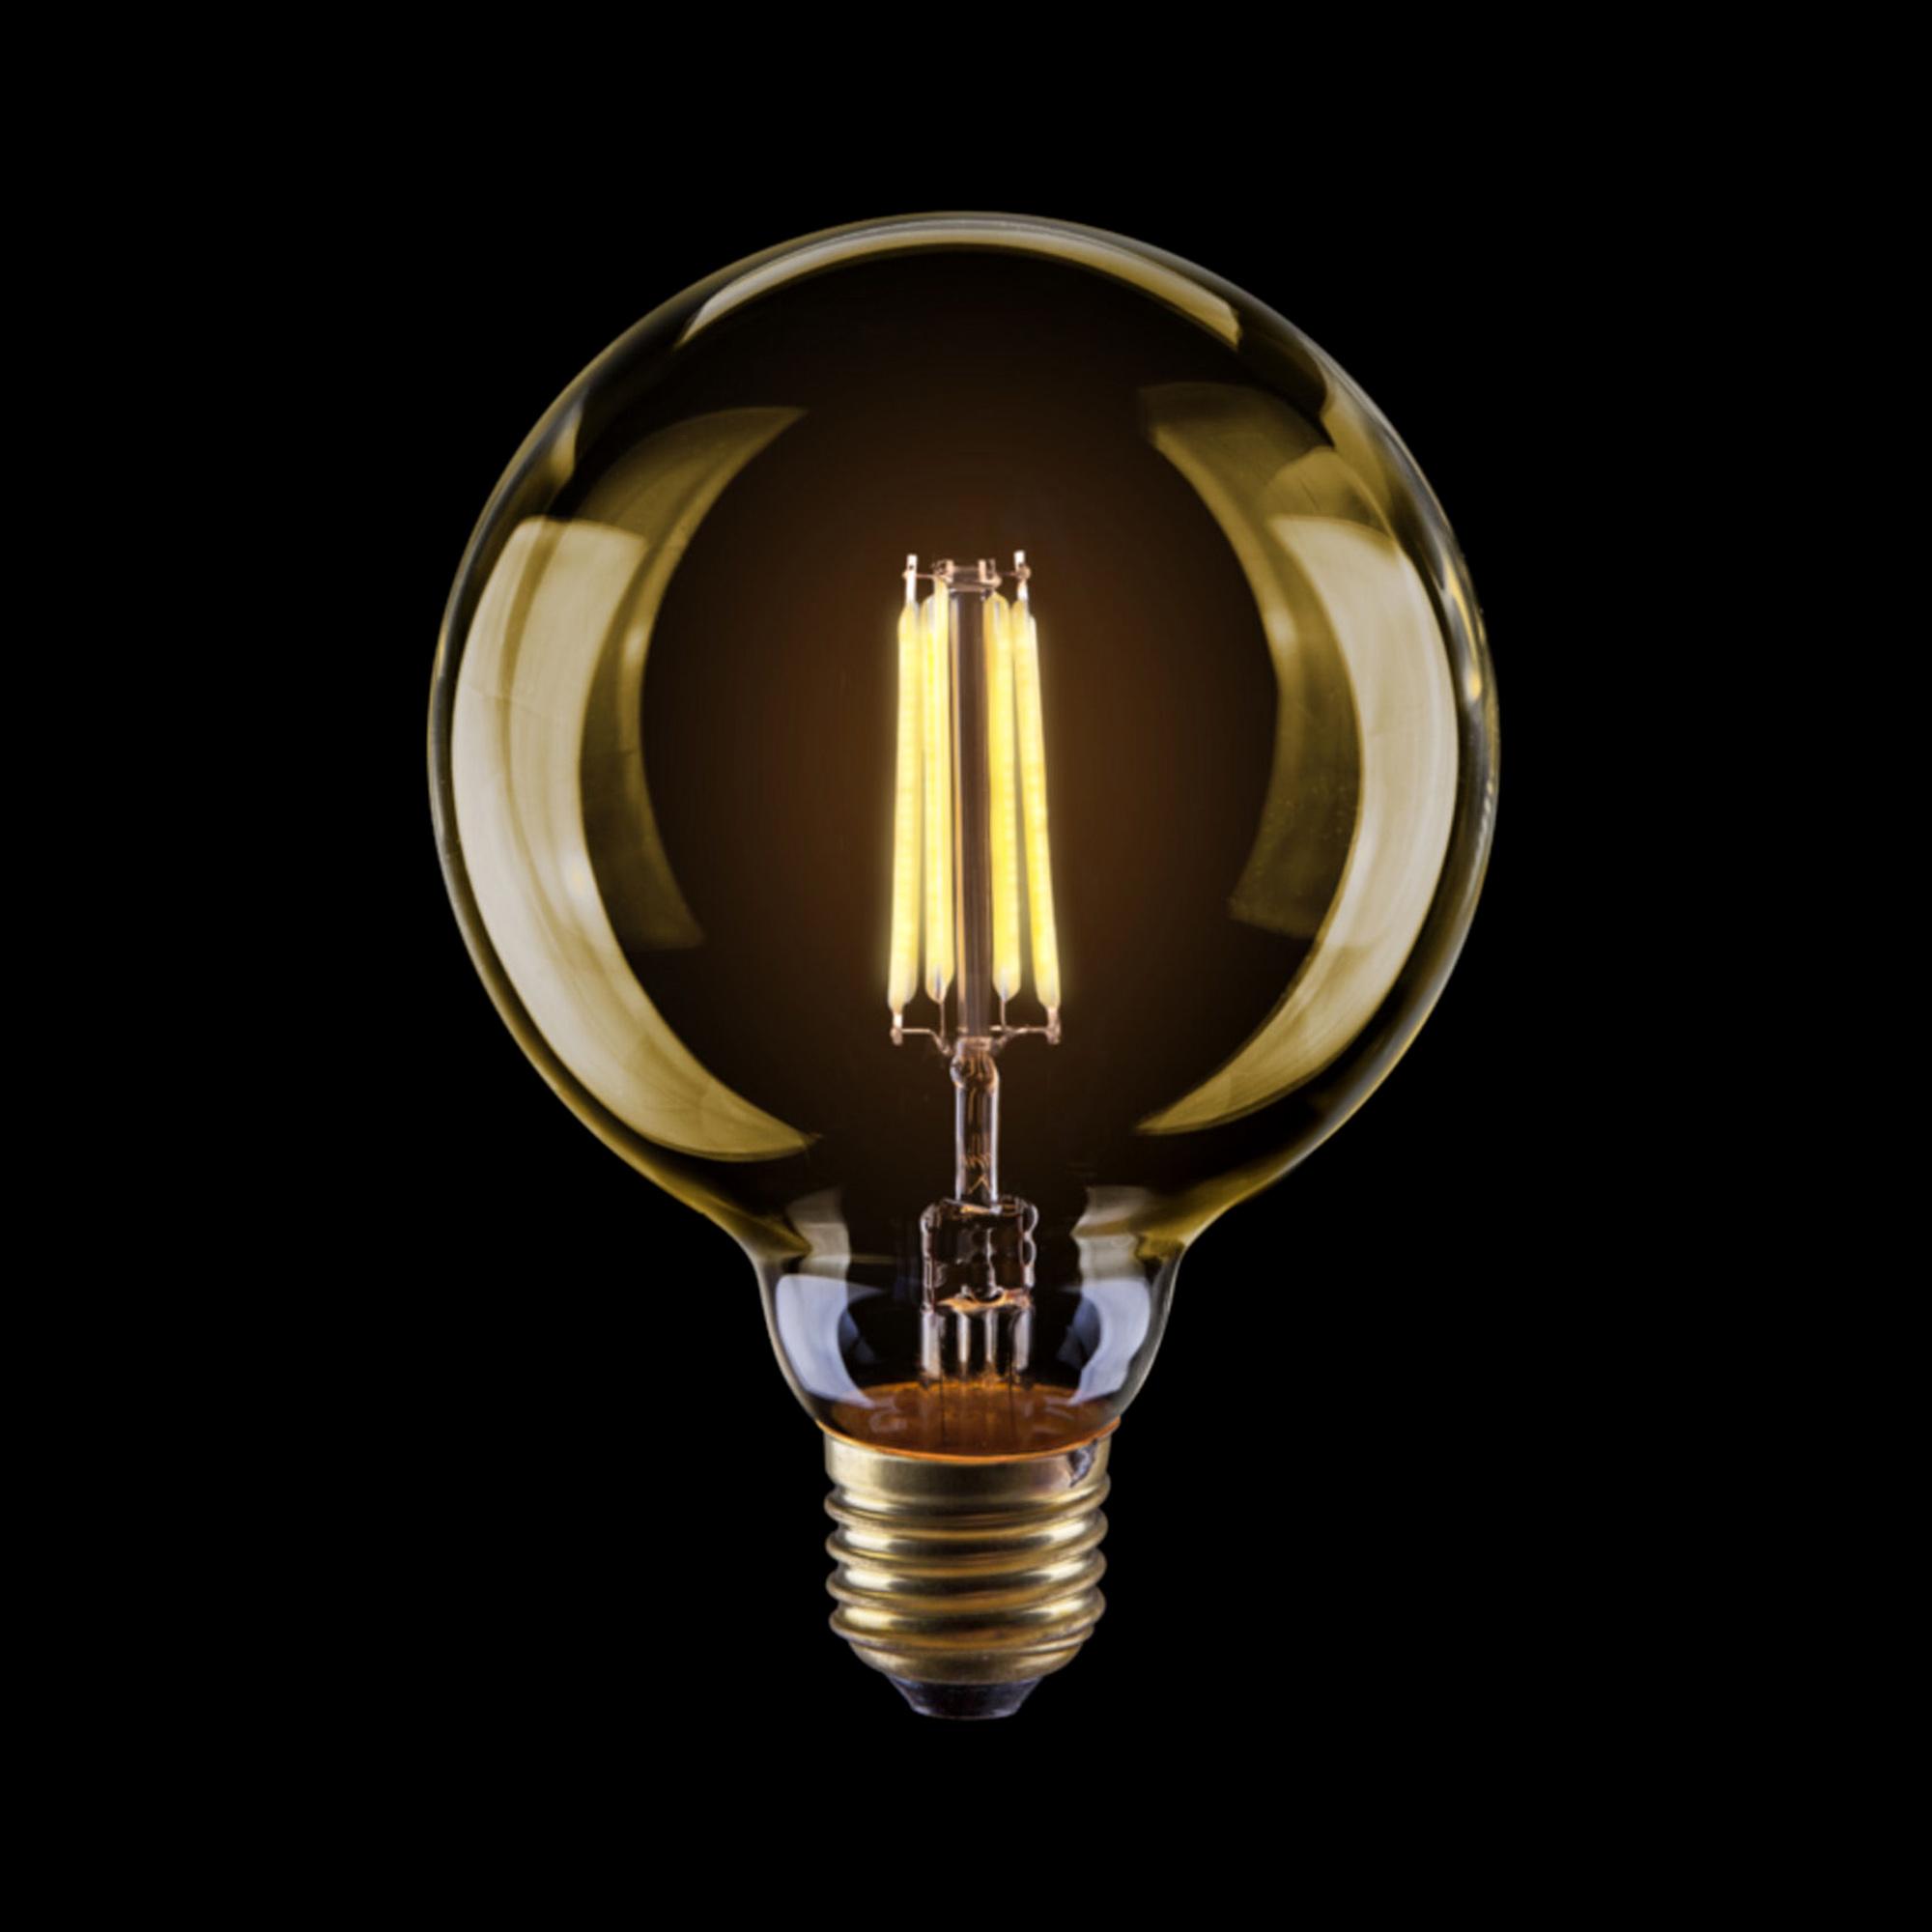 Фото - Лампочка Voltega Globe диммируемая Е27 4W 2800К лампочка voltega candel matt е27 6w 2800к